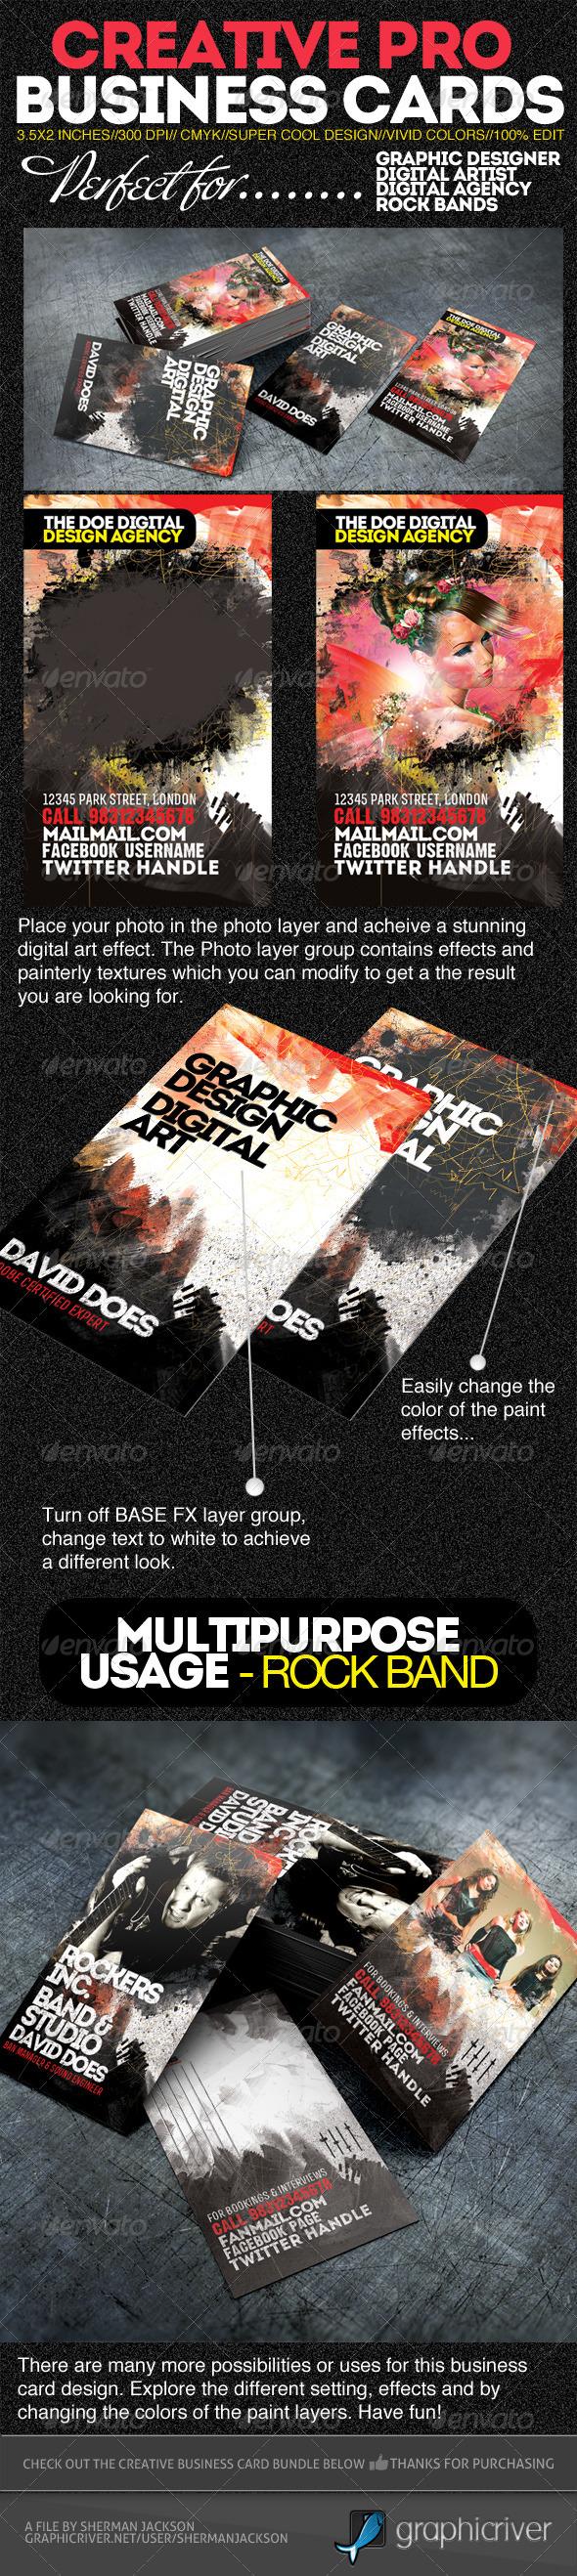 Creative Pro Designer Business Cards PSD Template - Creative Business Cards